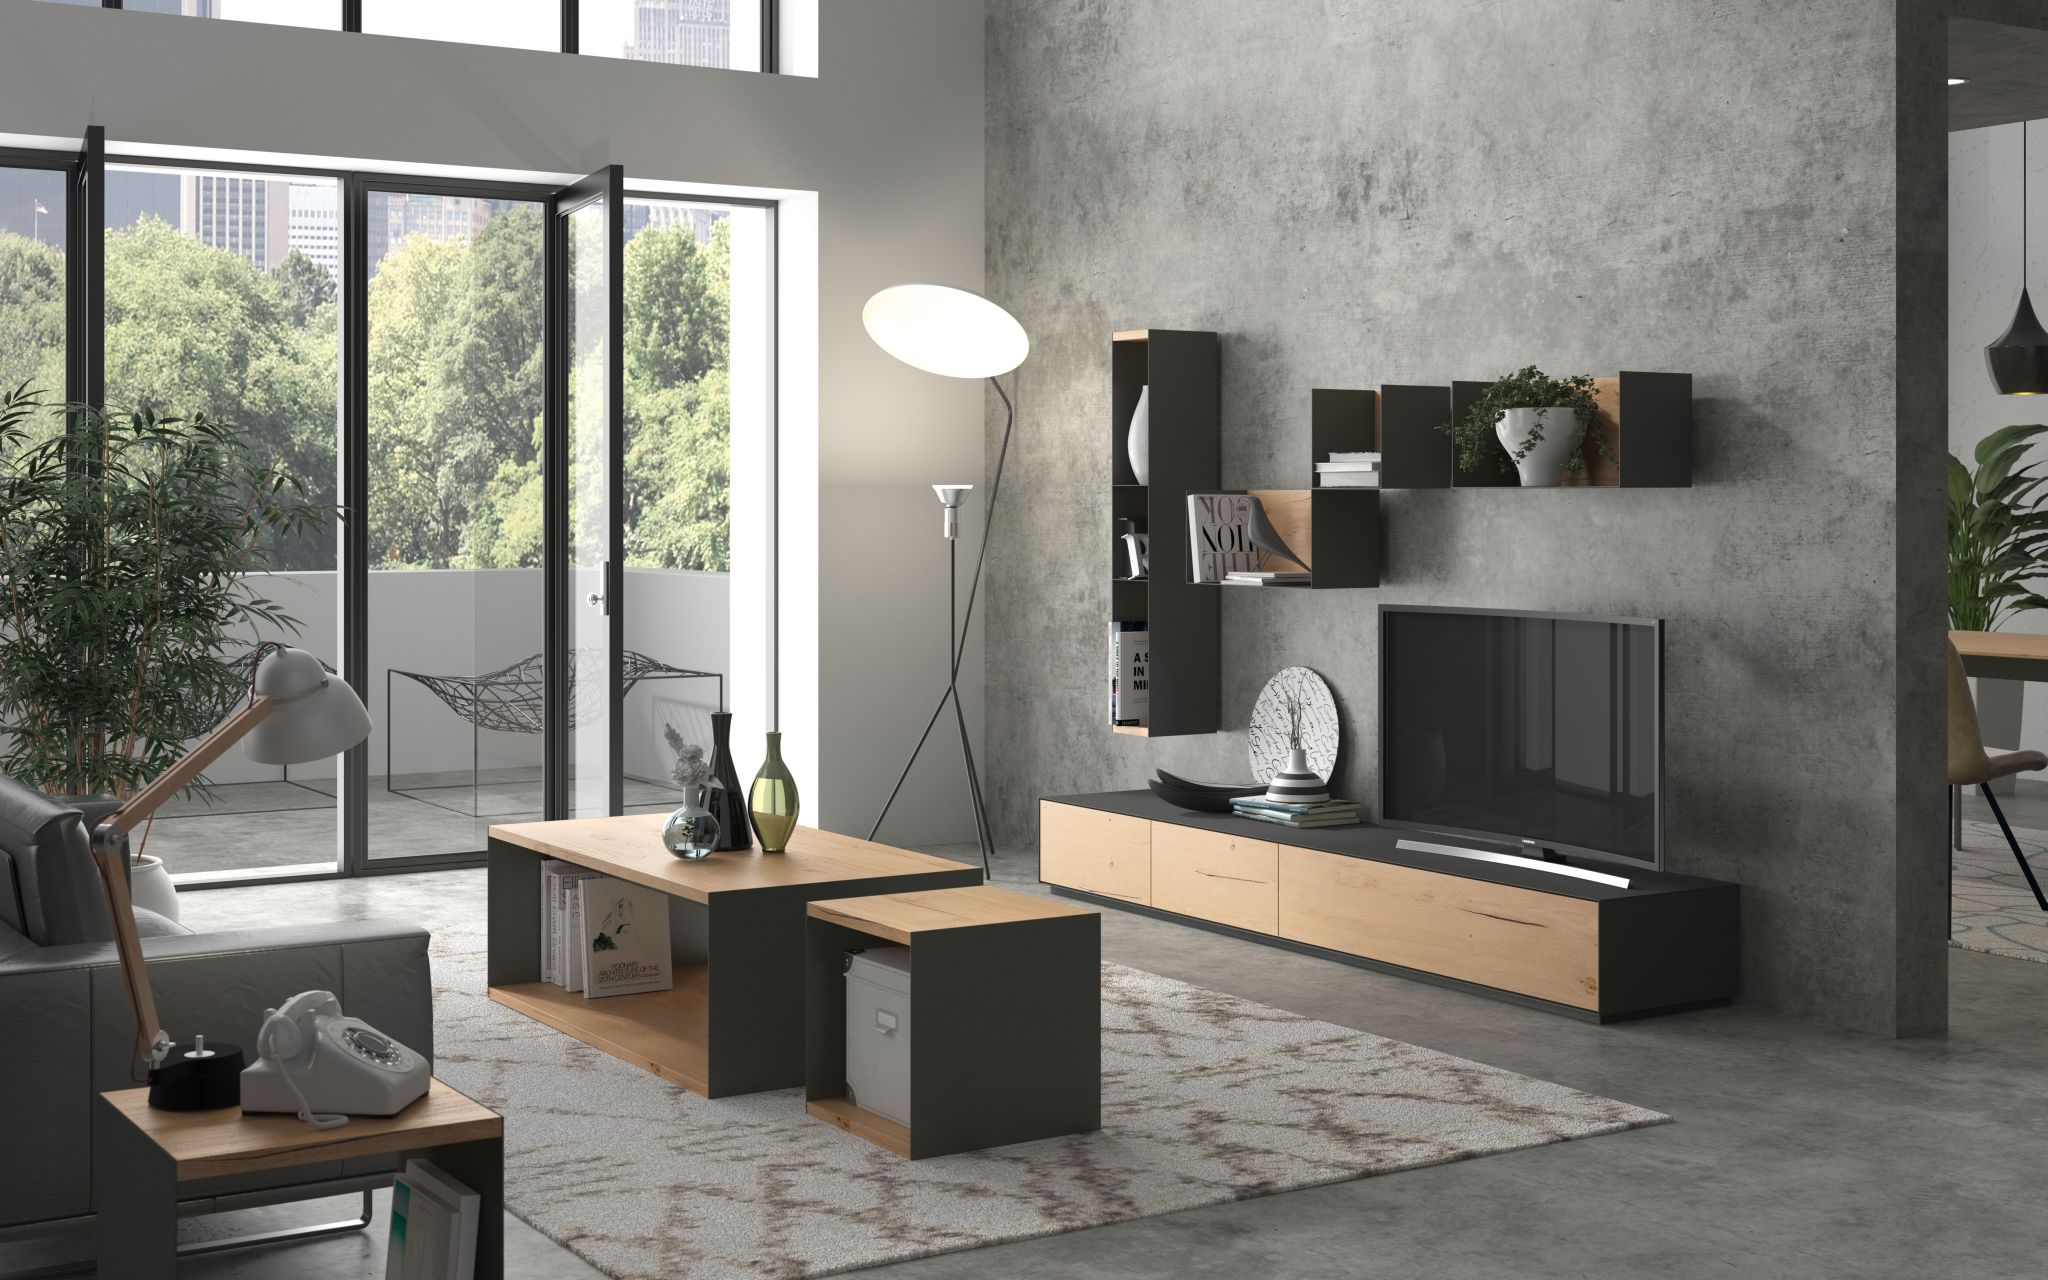 meubles hanse meubles. Black Bedroom Furniture Sets. Home Design Ideas